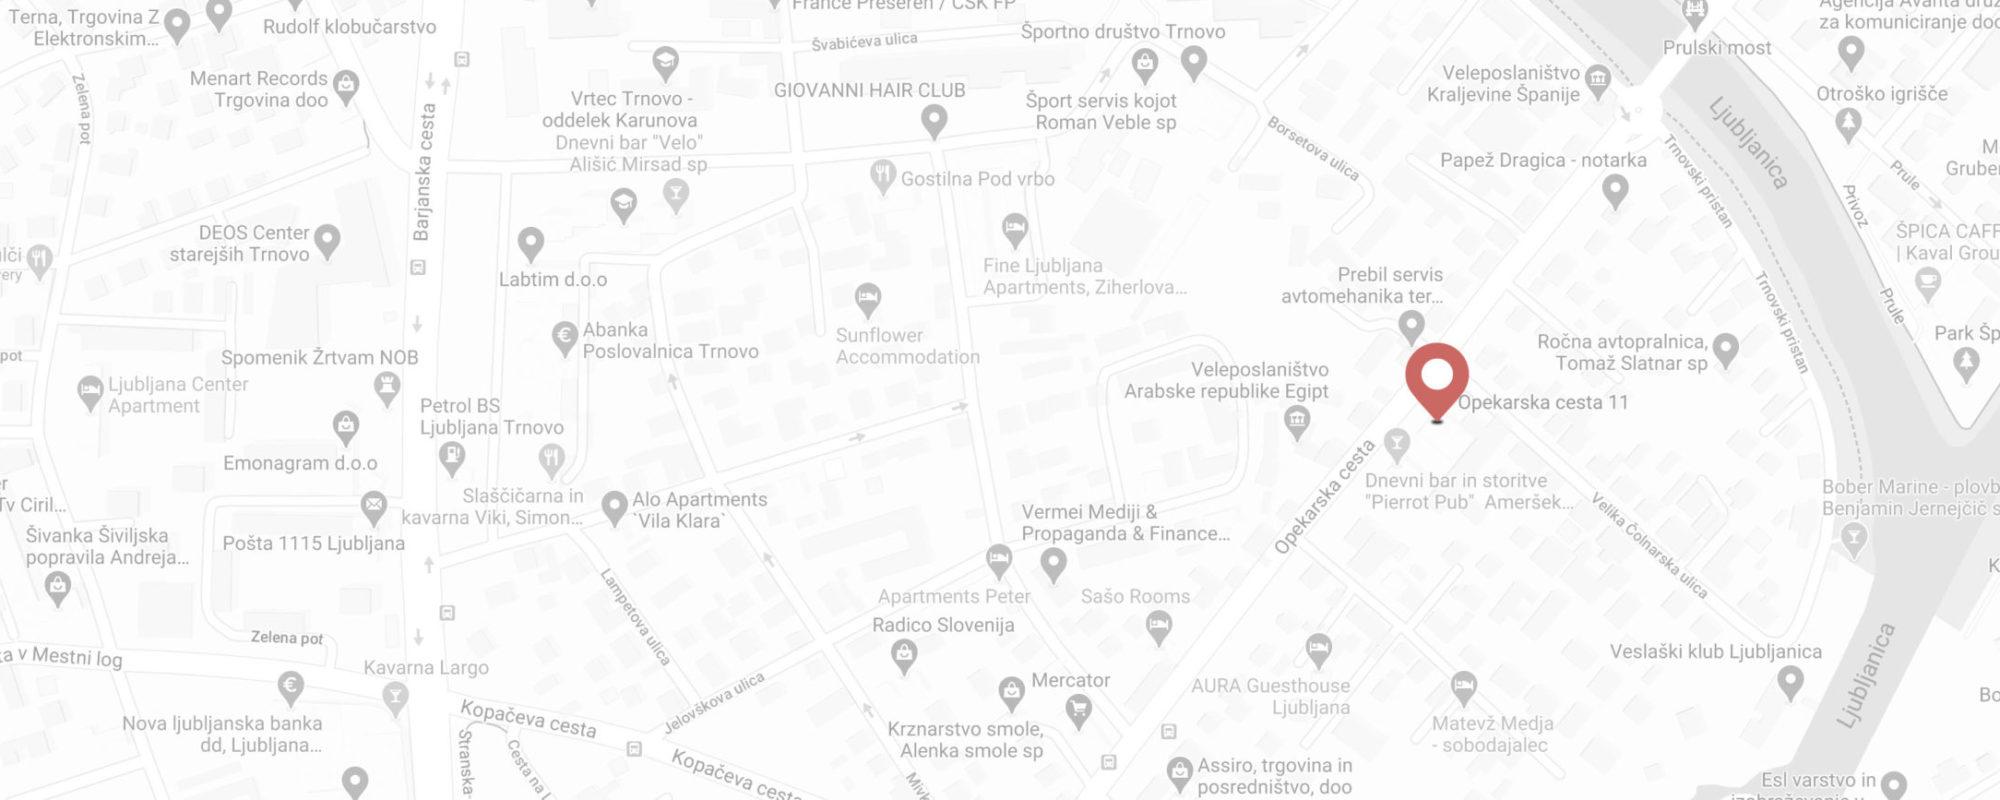 Google-maps-Lea-Pisani-Opekarska